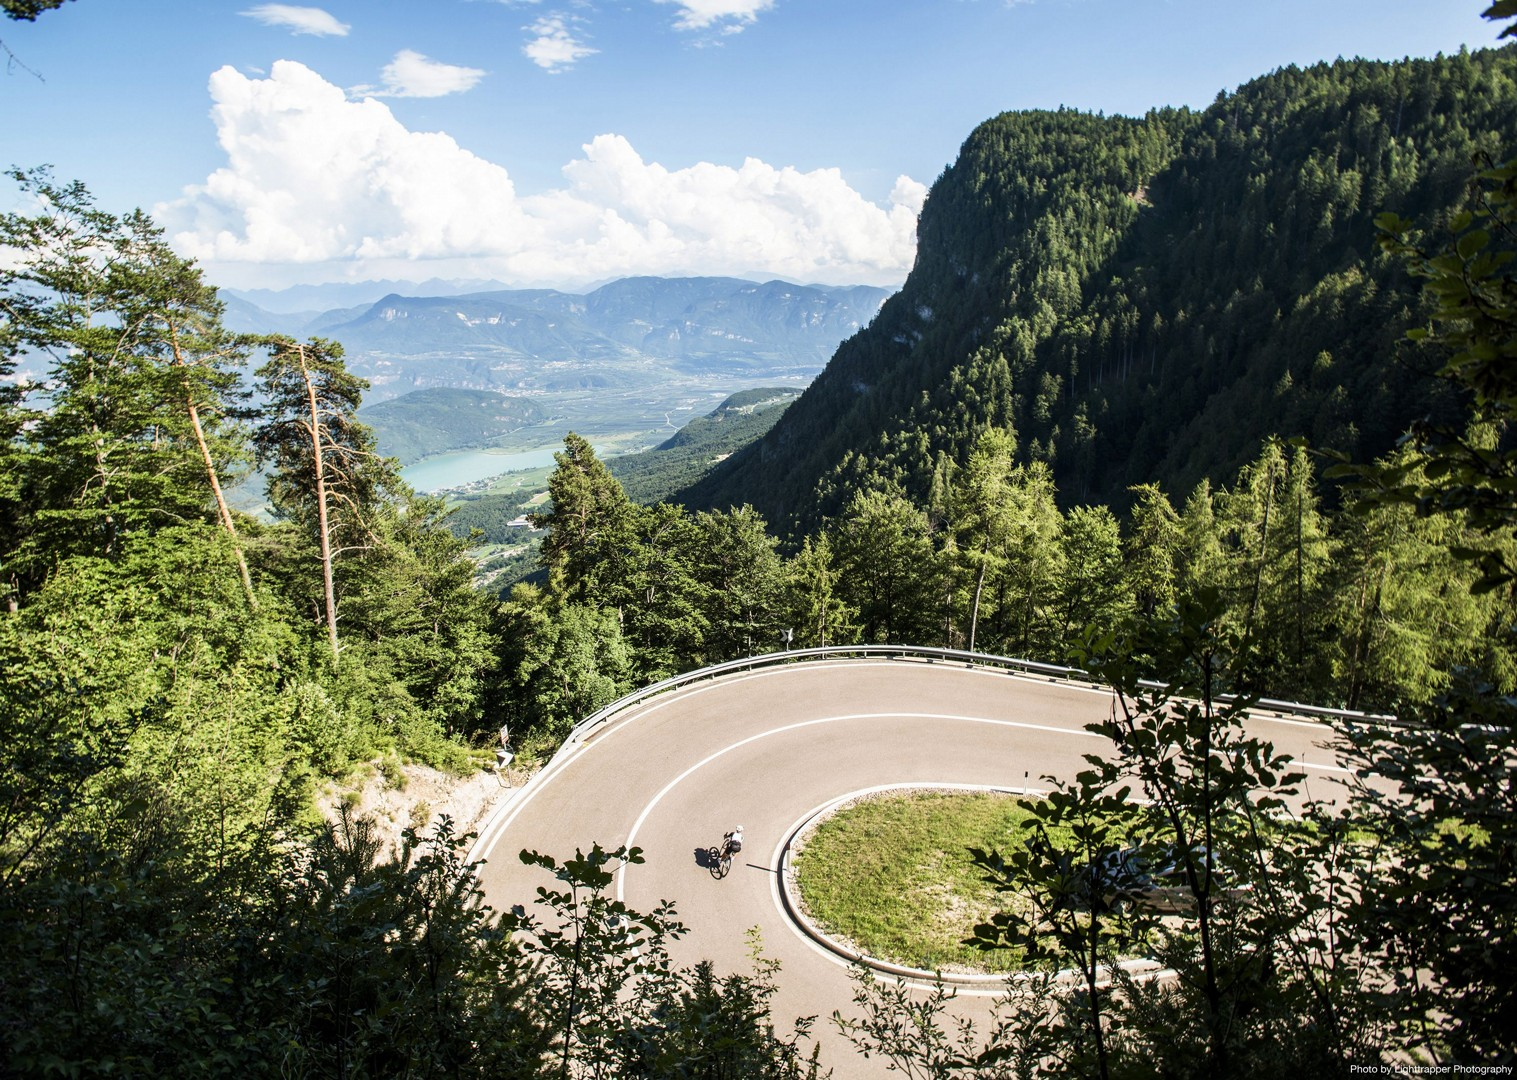 guided-road-cycling-holiday-italy-italian-alps.jpg - Italy - Alps and Dolomites - Giants of the Giro - Guided Road Cycling Holiday - Road Cycling